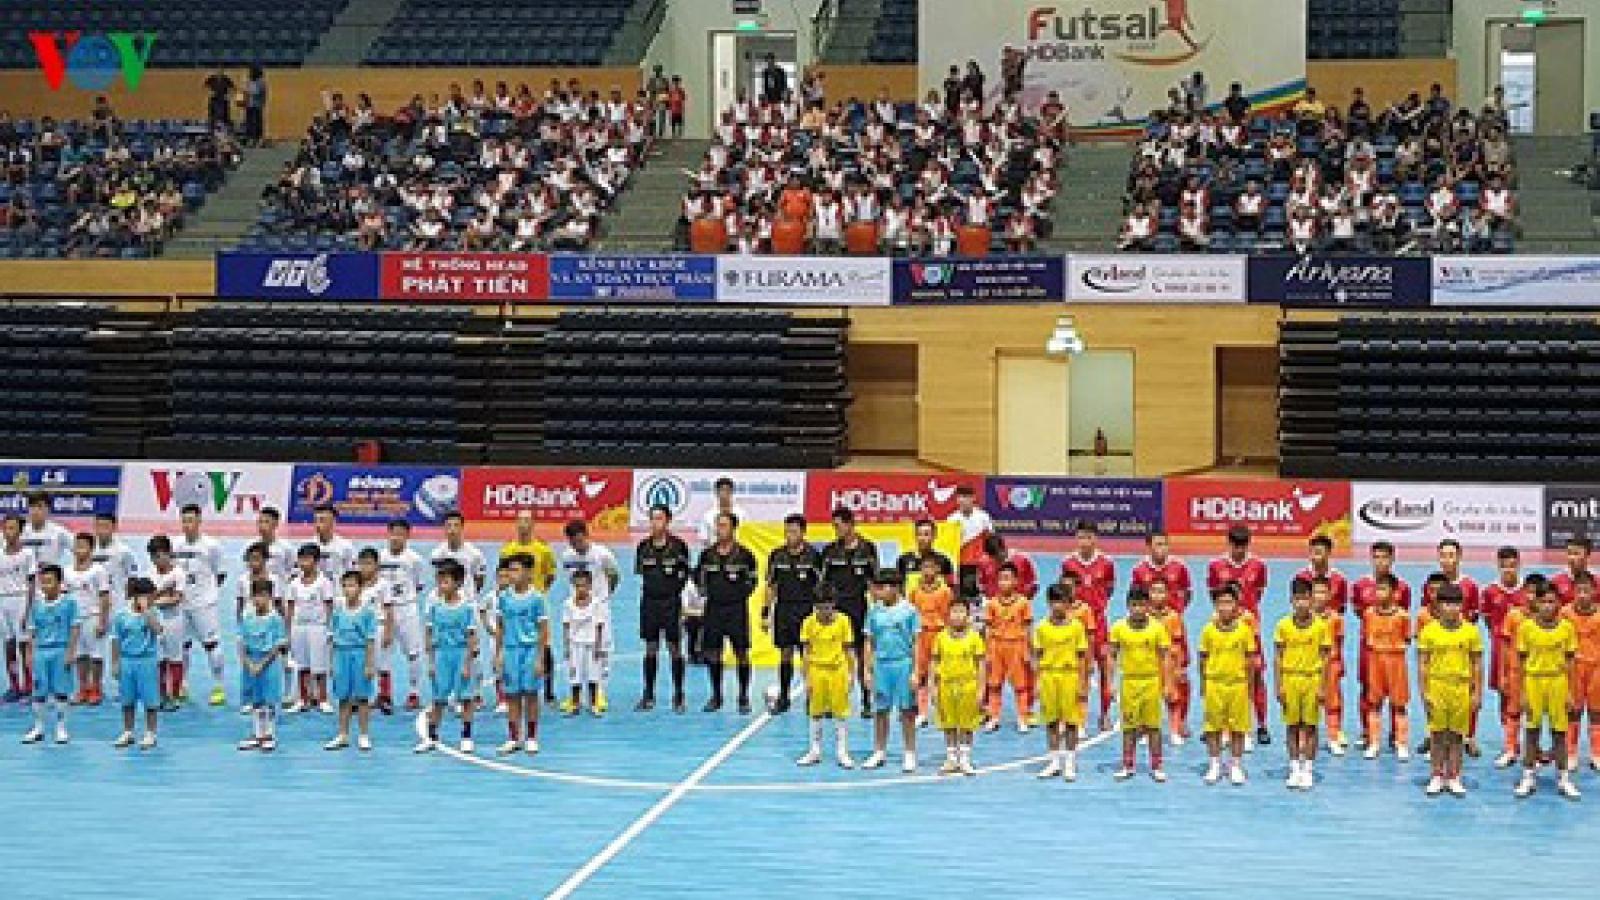 National Futsal HDBank Cup 2017 opens in Danang